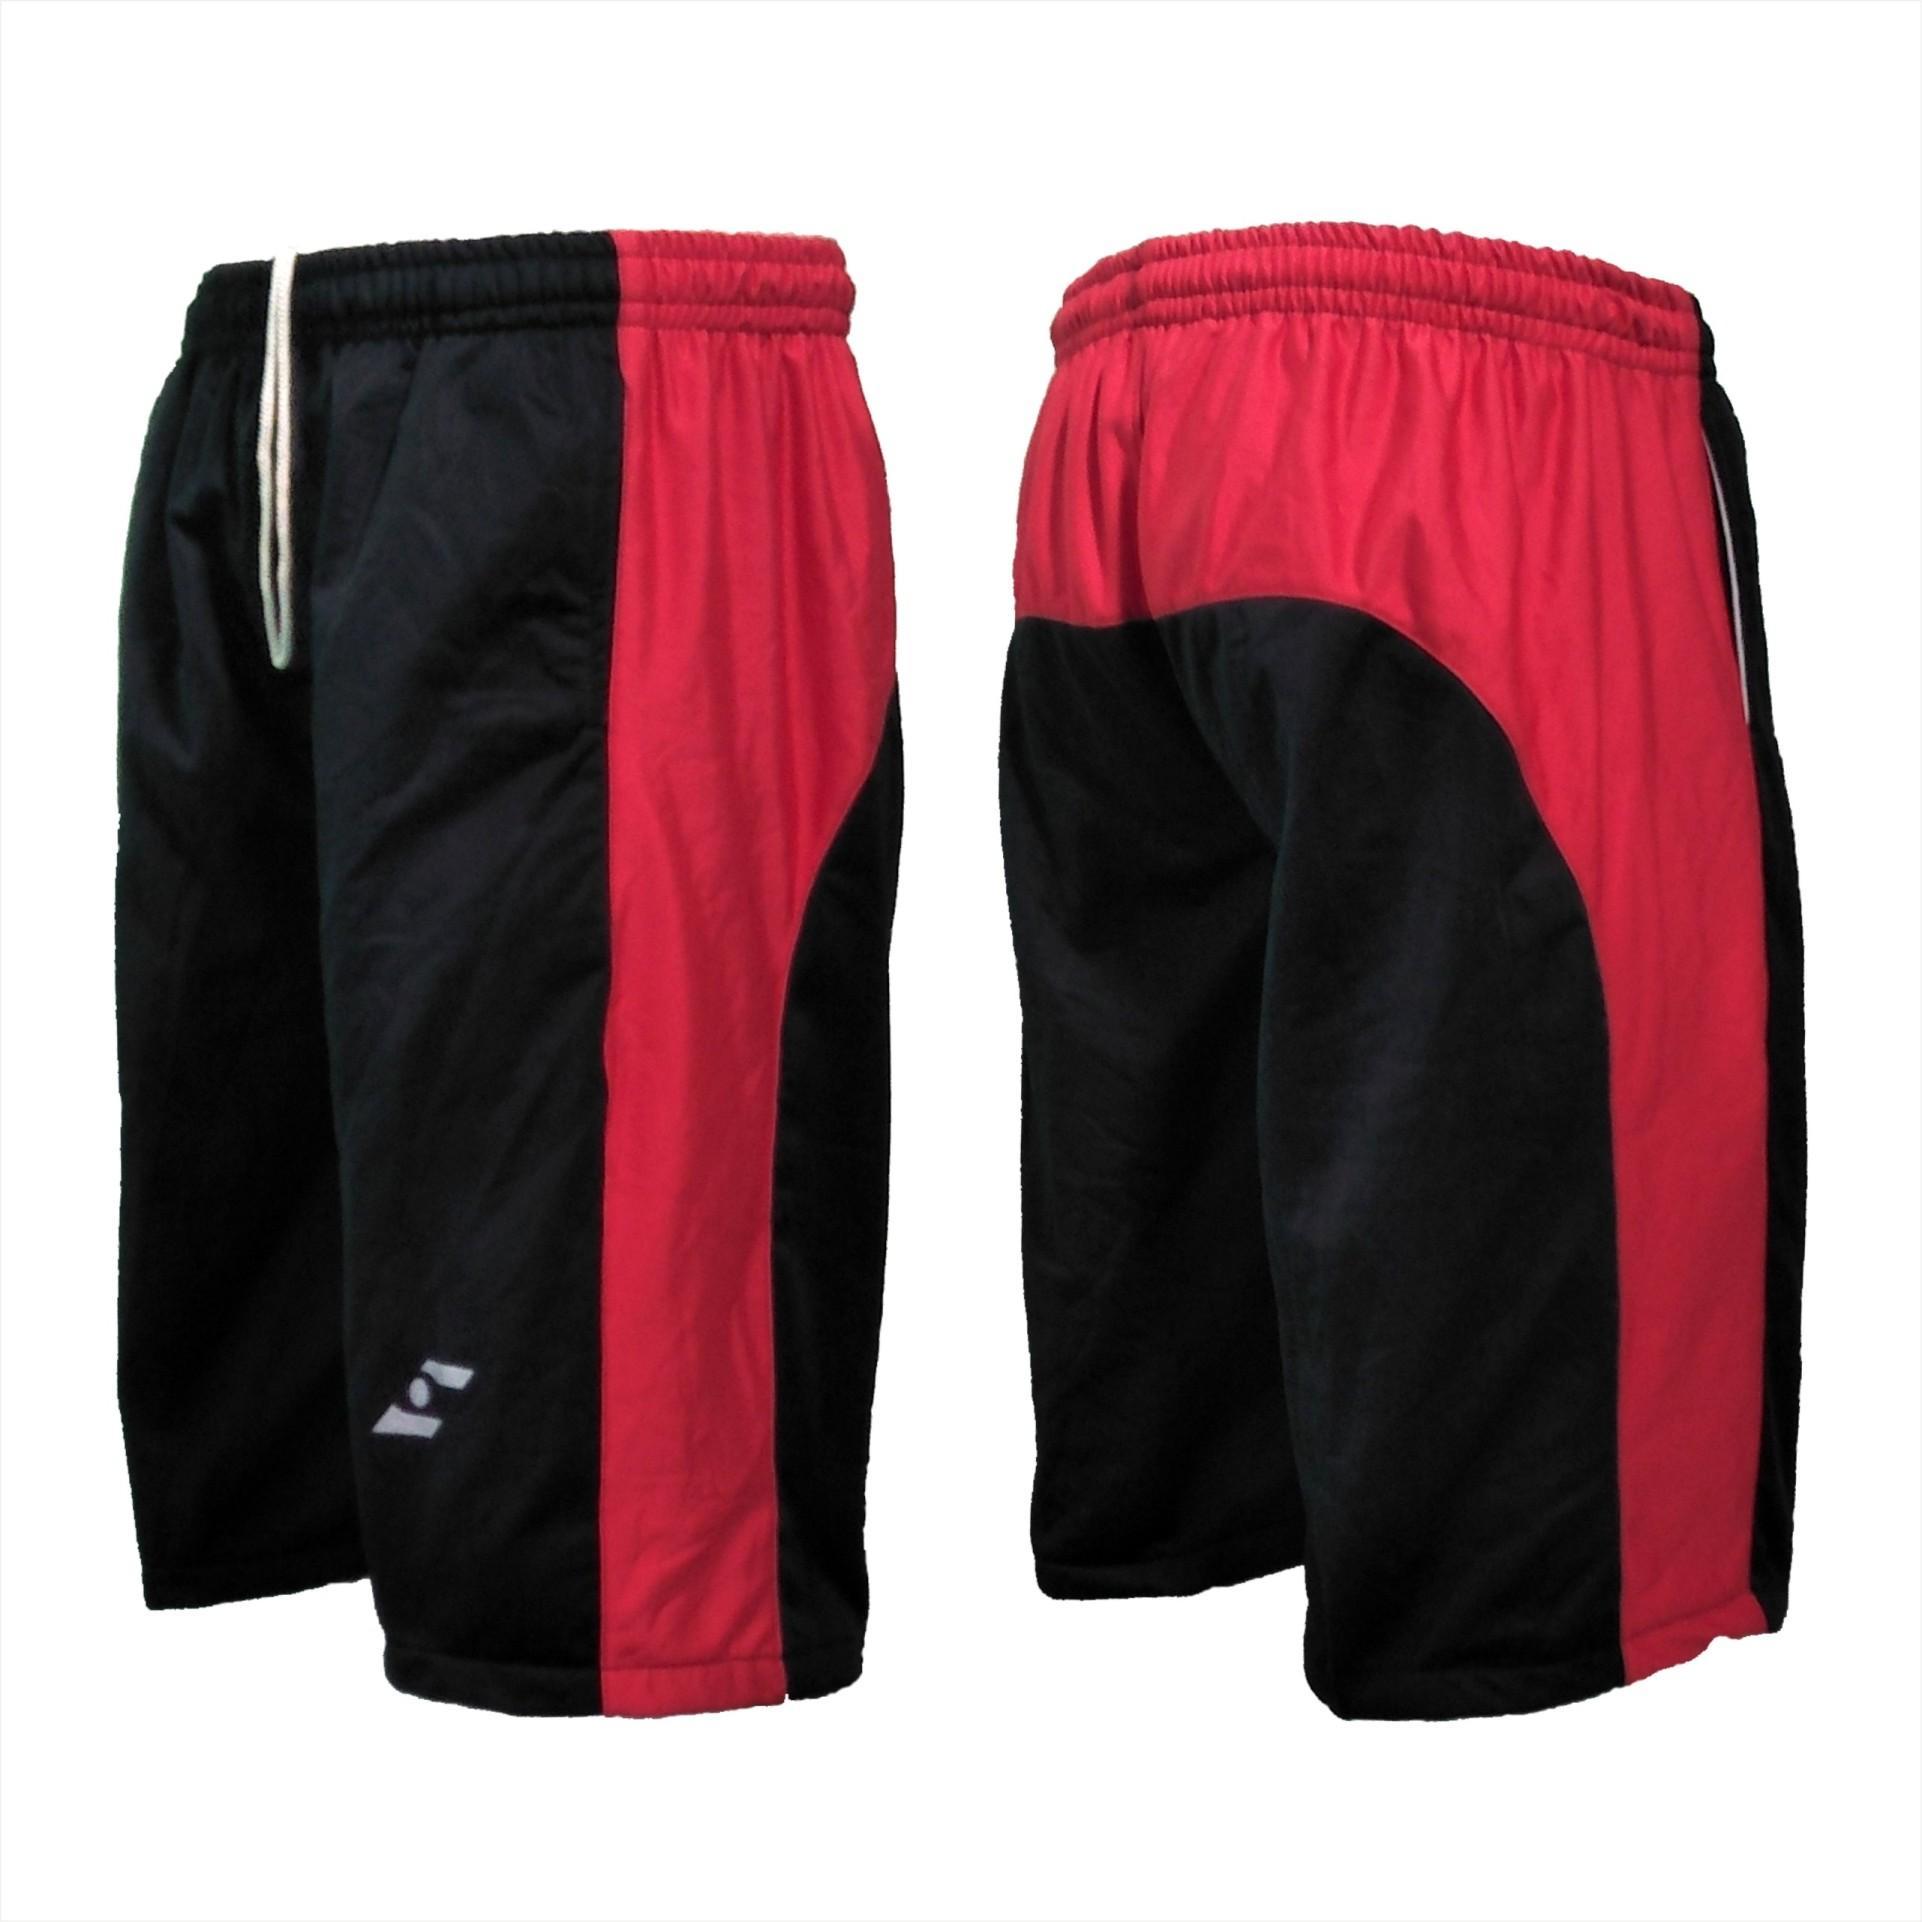 Arsy Sport Celana Pendek Pria Celana Training - Hitam turkis. Source · Celana Tiga Per